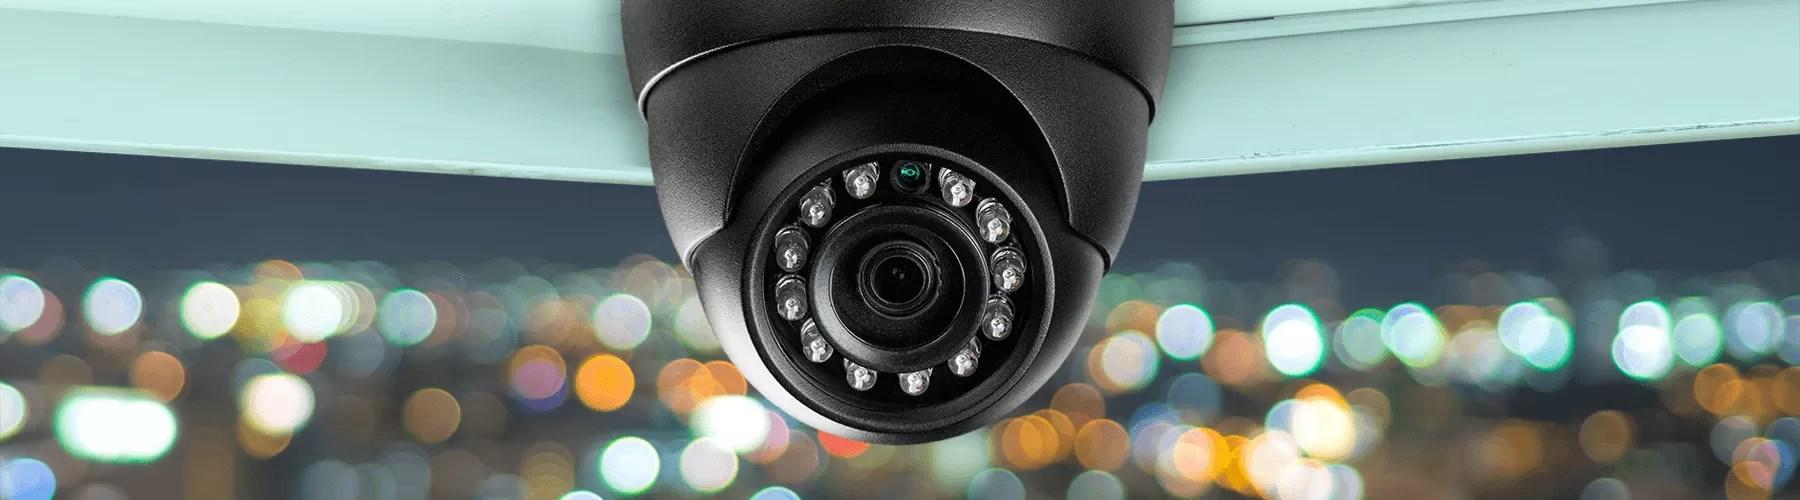 BBG security camera Brant & Paris,ON